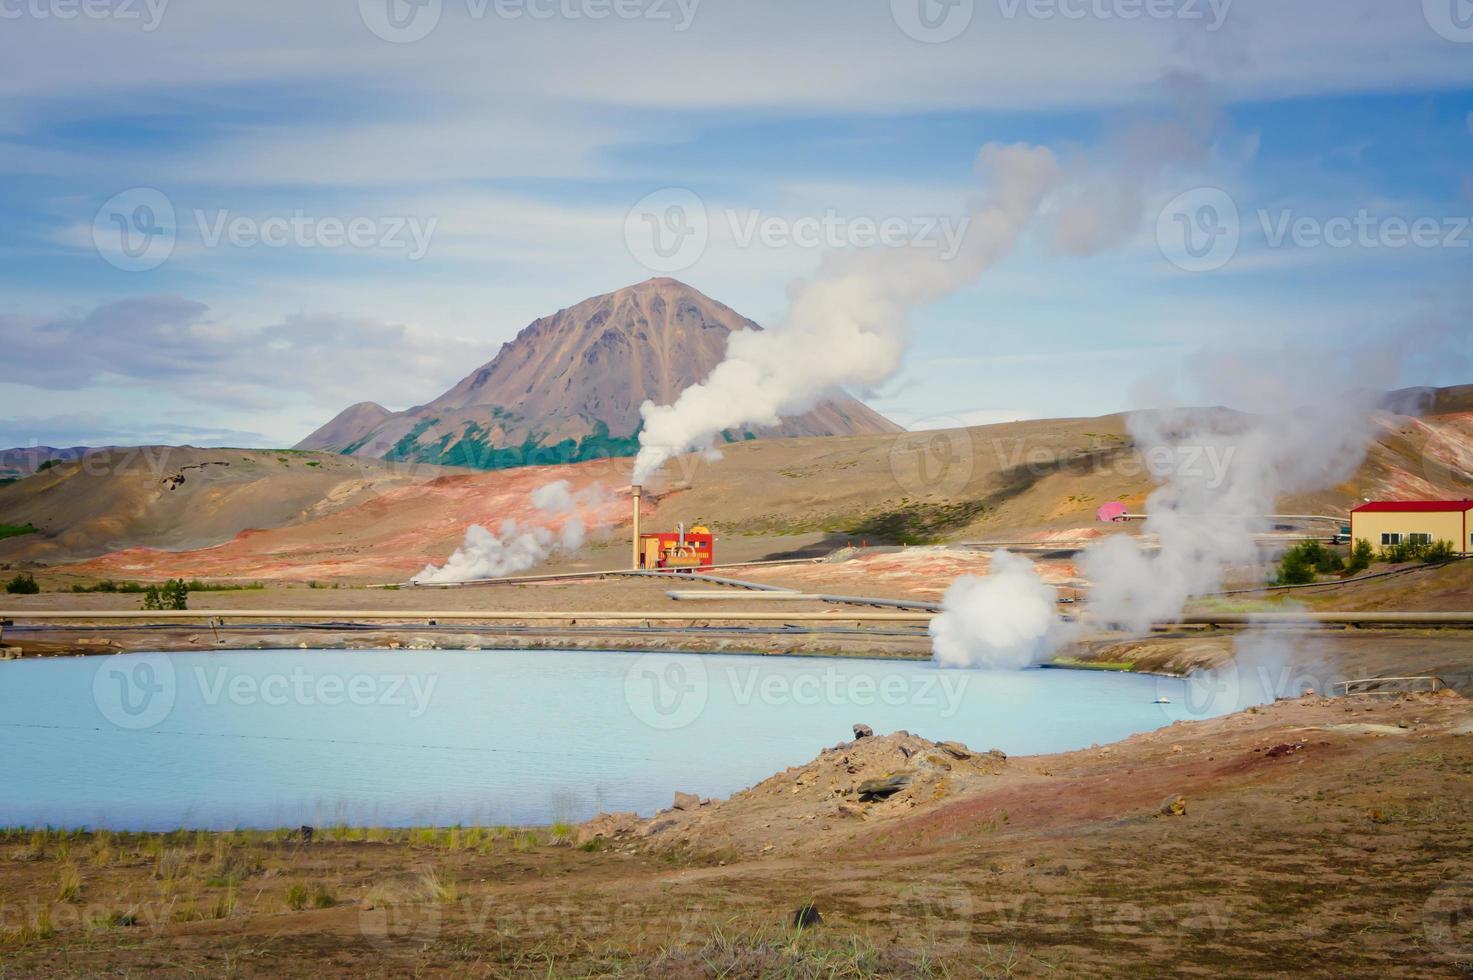 famoso sito geotermico islandese hverir hveravellyr e vasi di fango foto